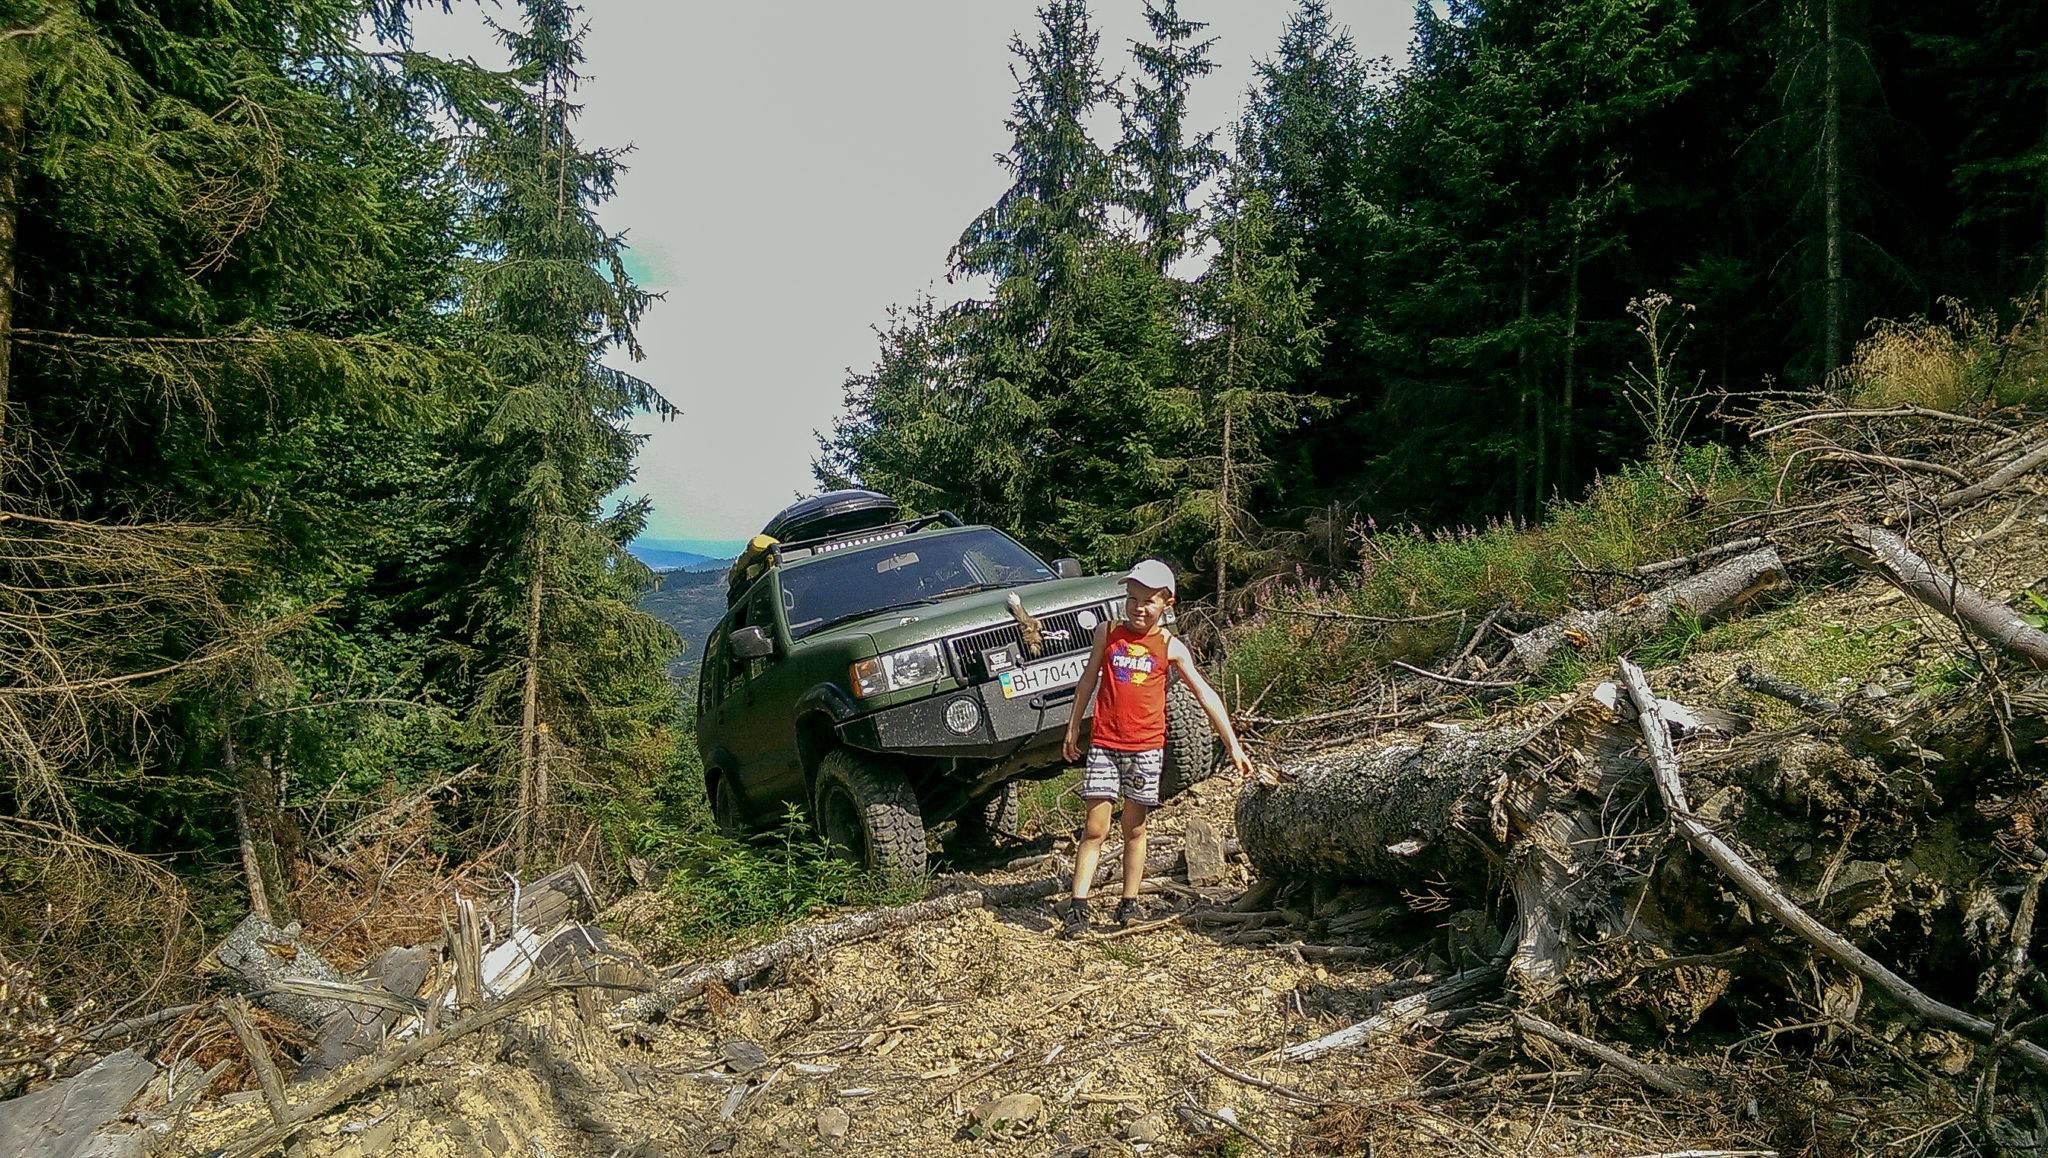 джиппинг в горах